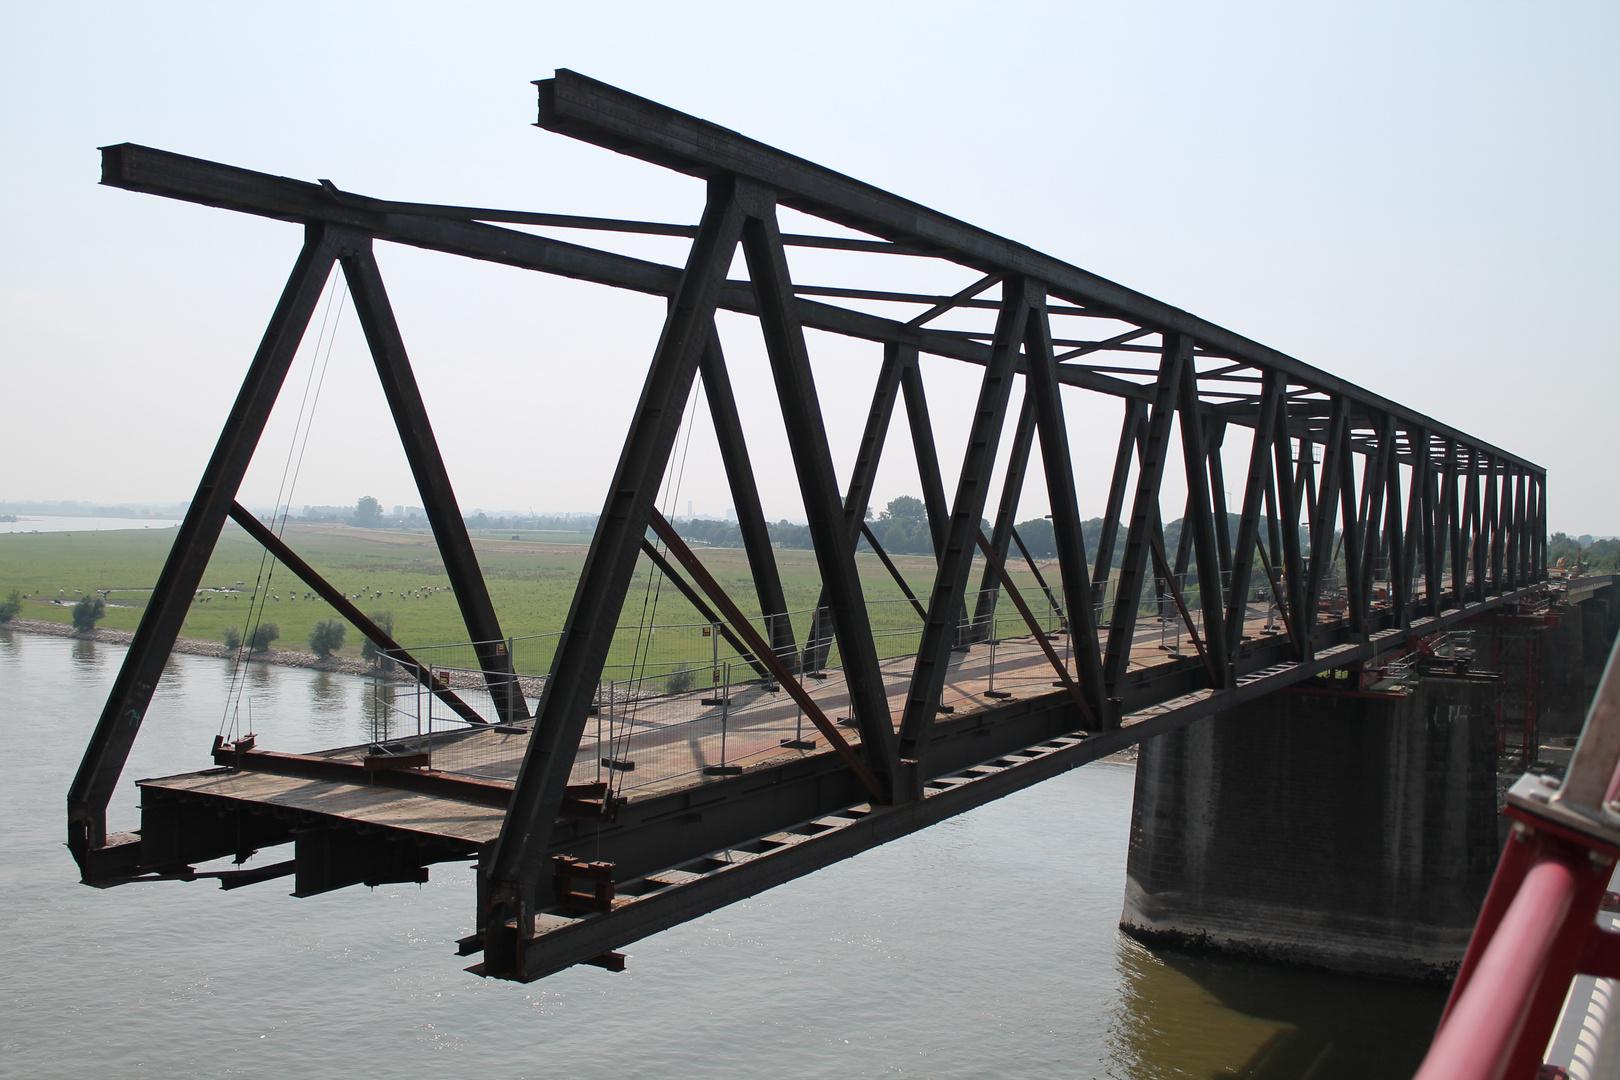 Die Brücke - original